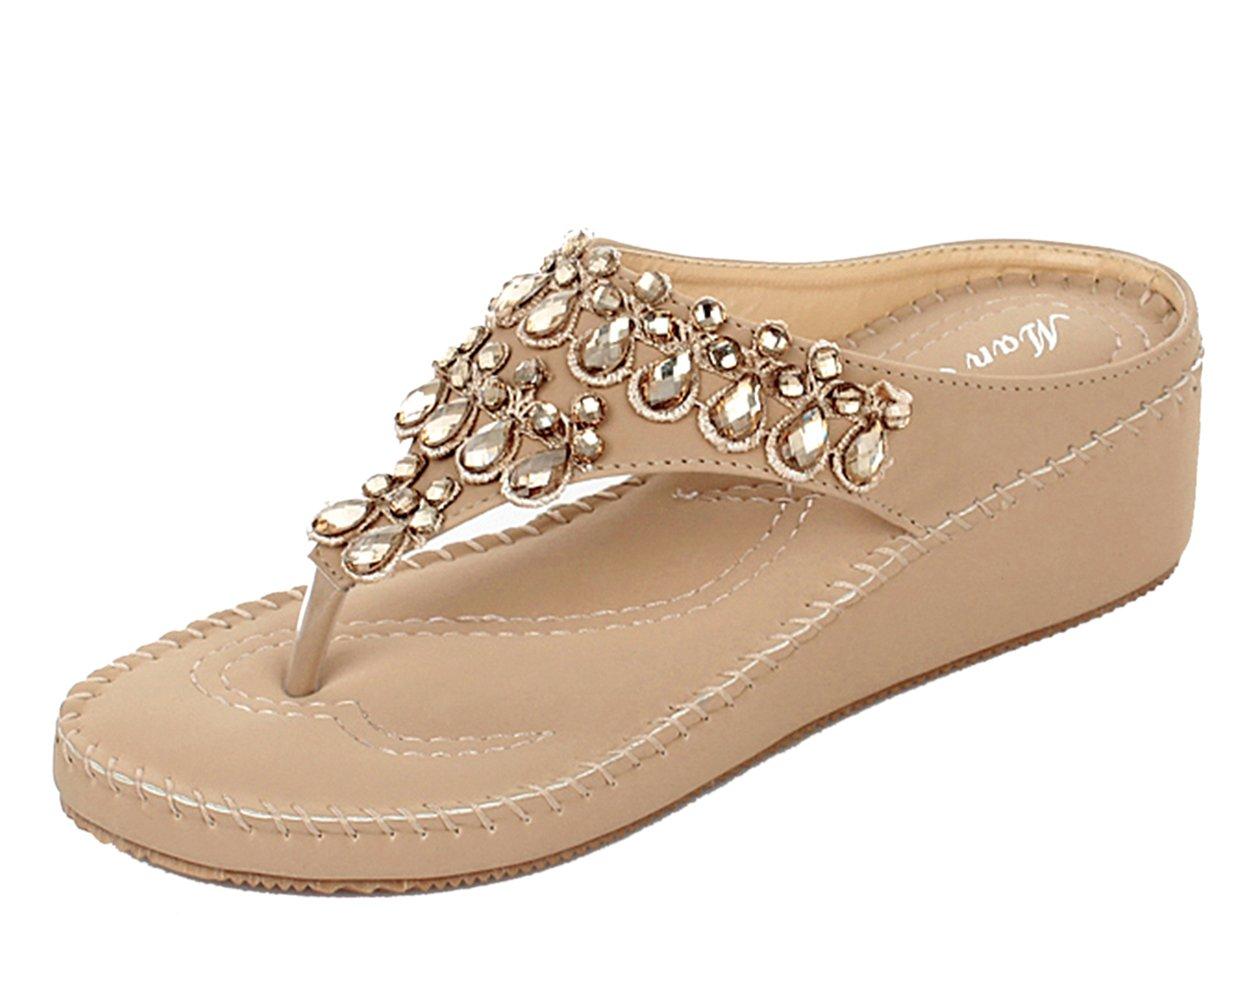 DQQ Damen Tanga Strass Stich Keil Sandale, Blau - 3 - Größe: 39